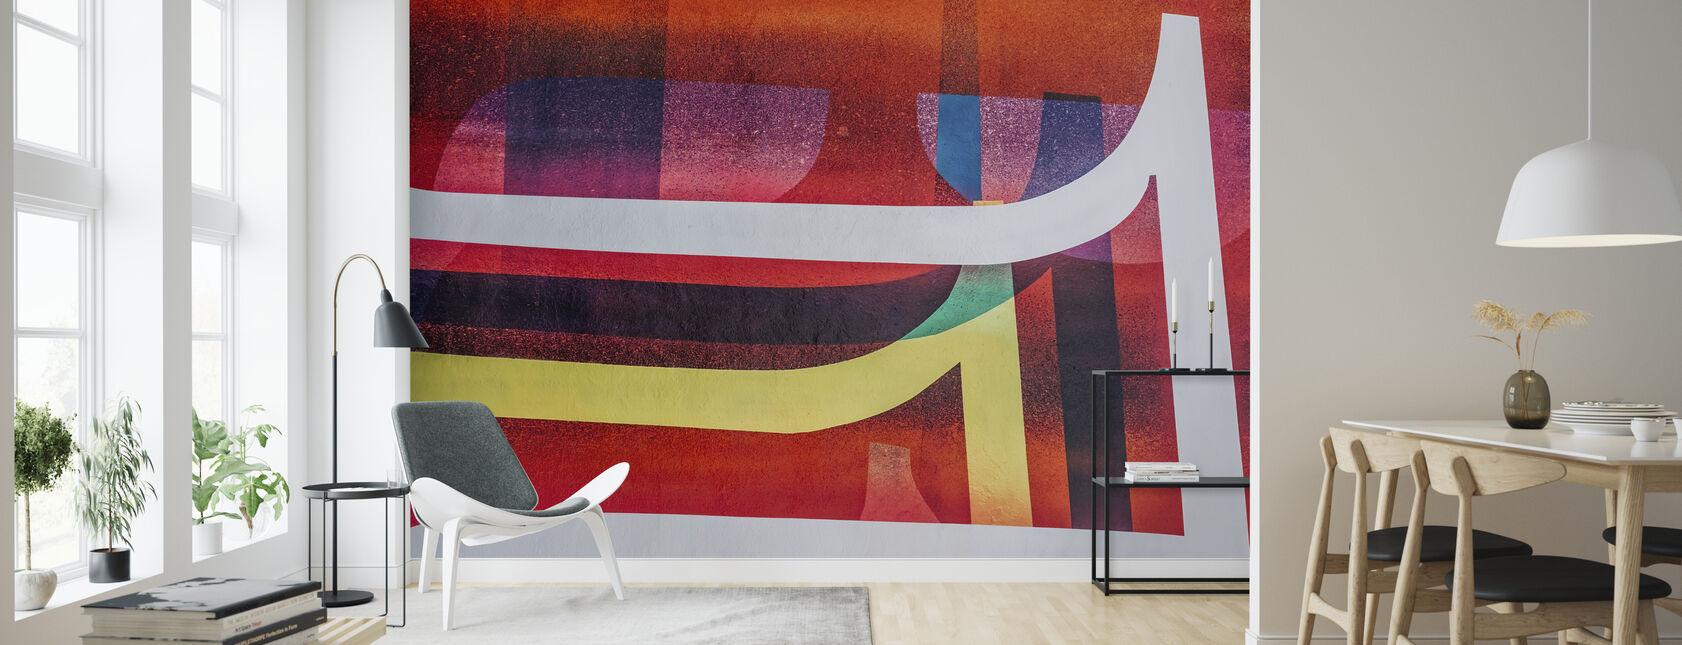 Visual Art - Wallpaper - Living Room